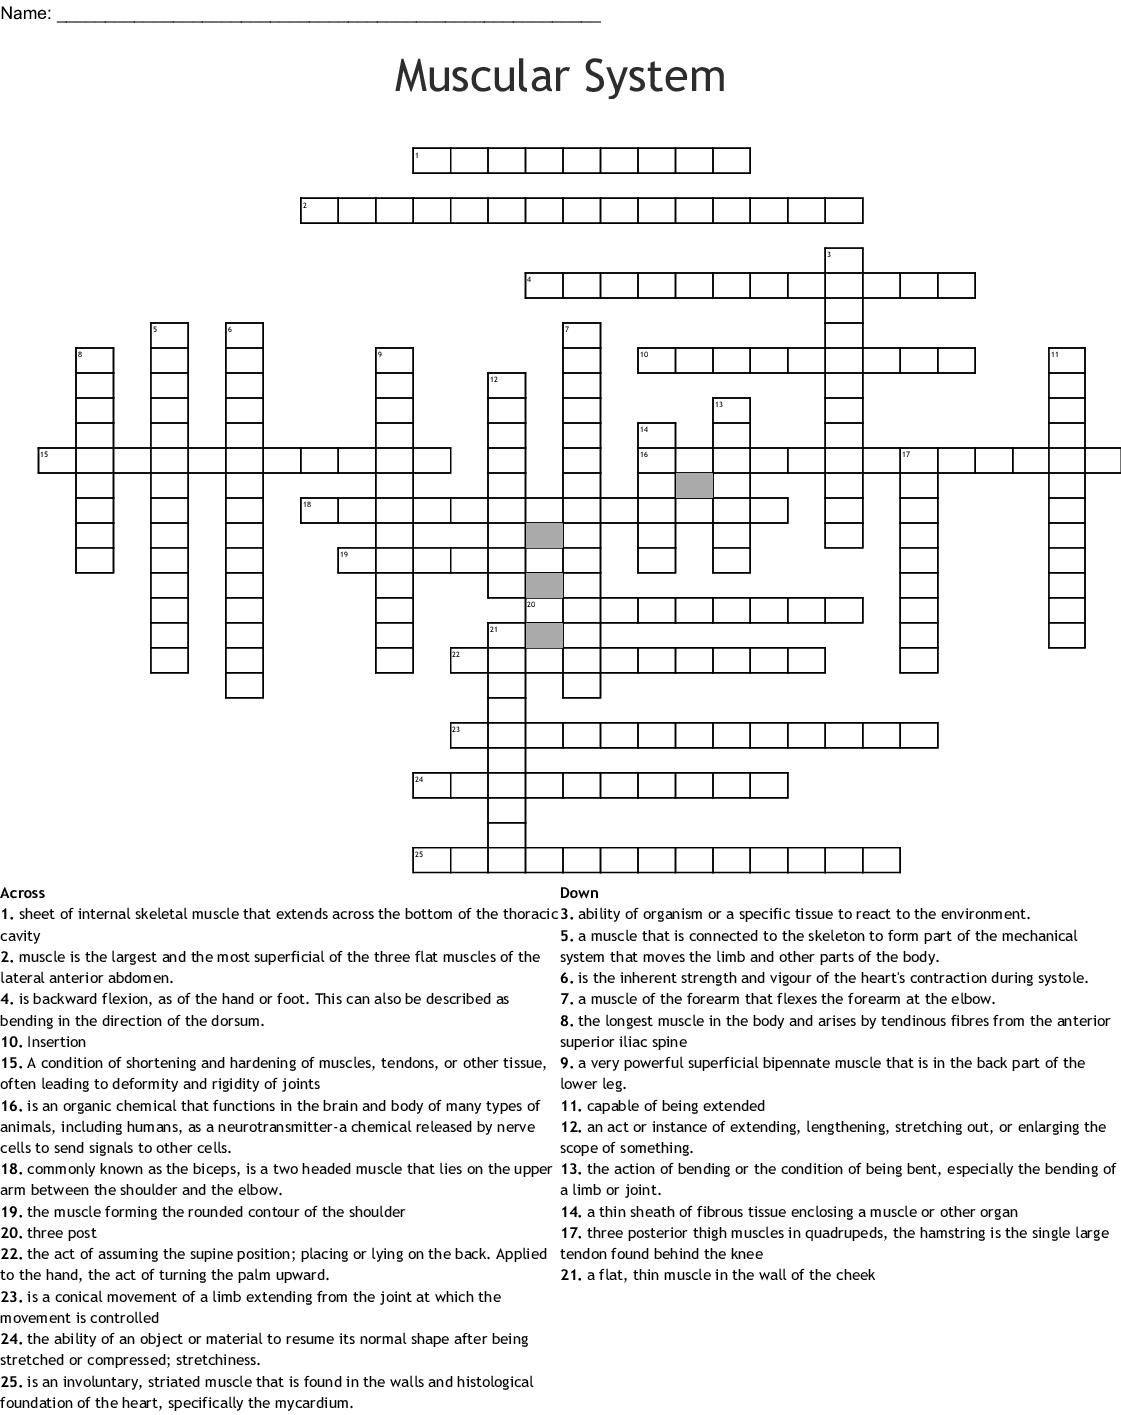 Muscular System Crossword